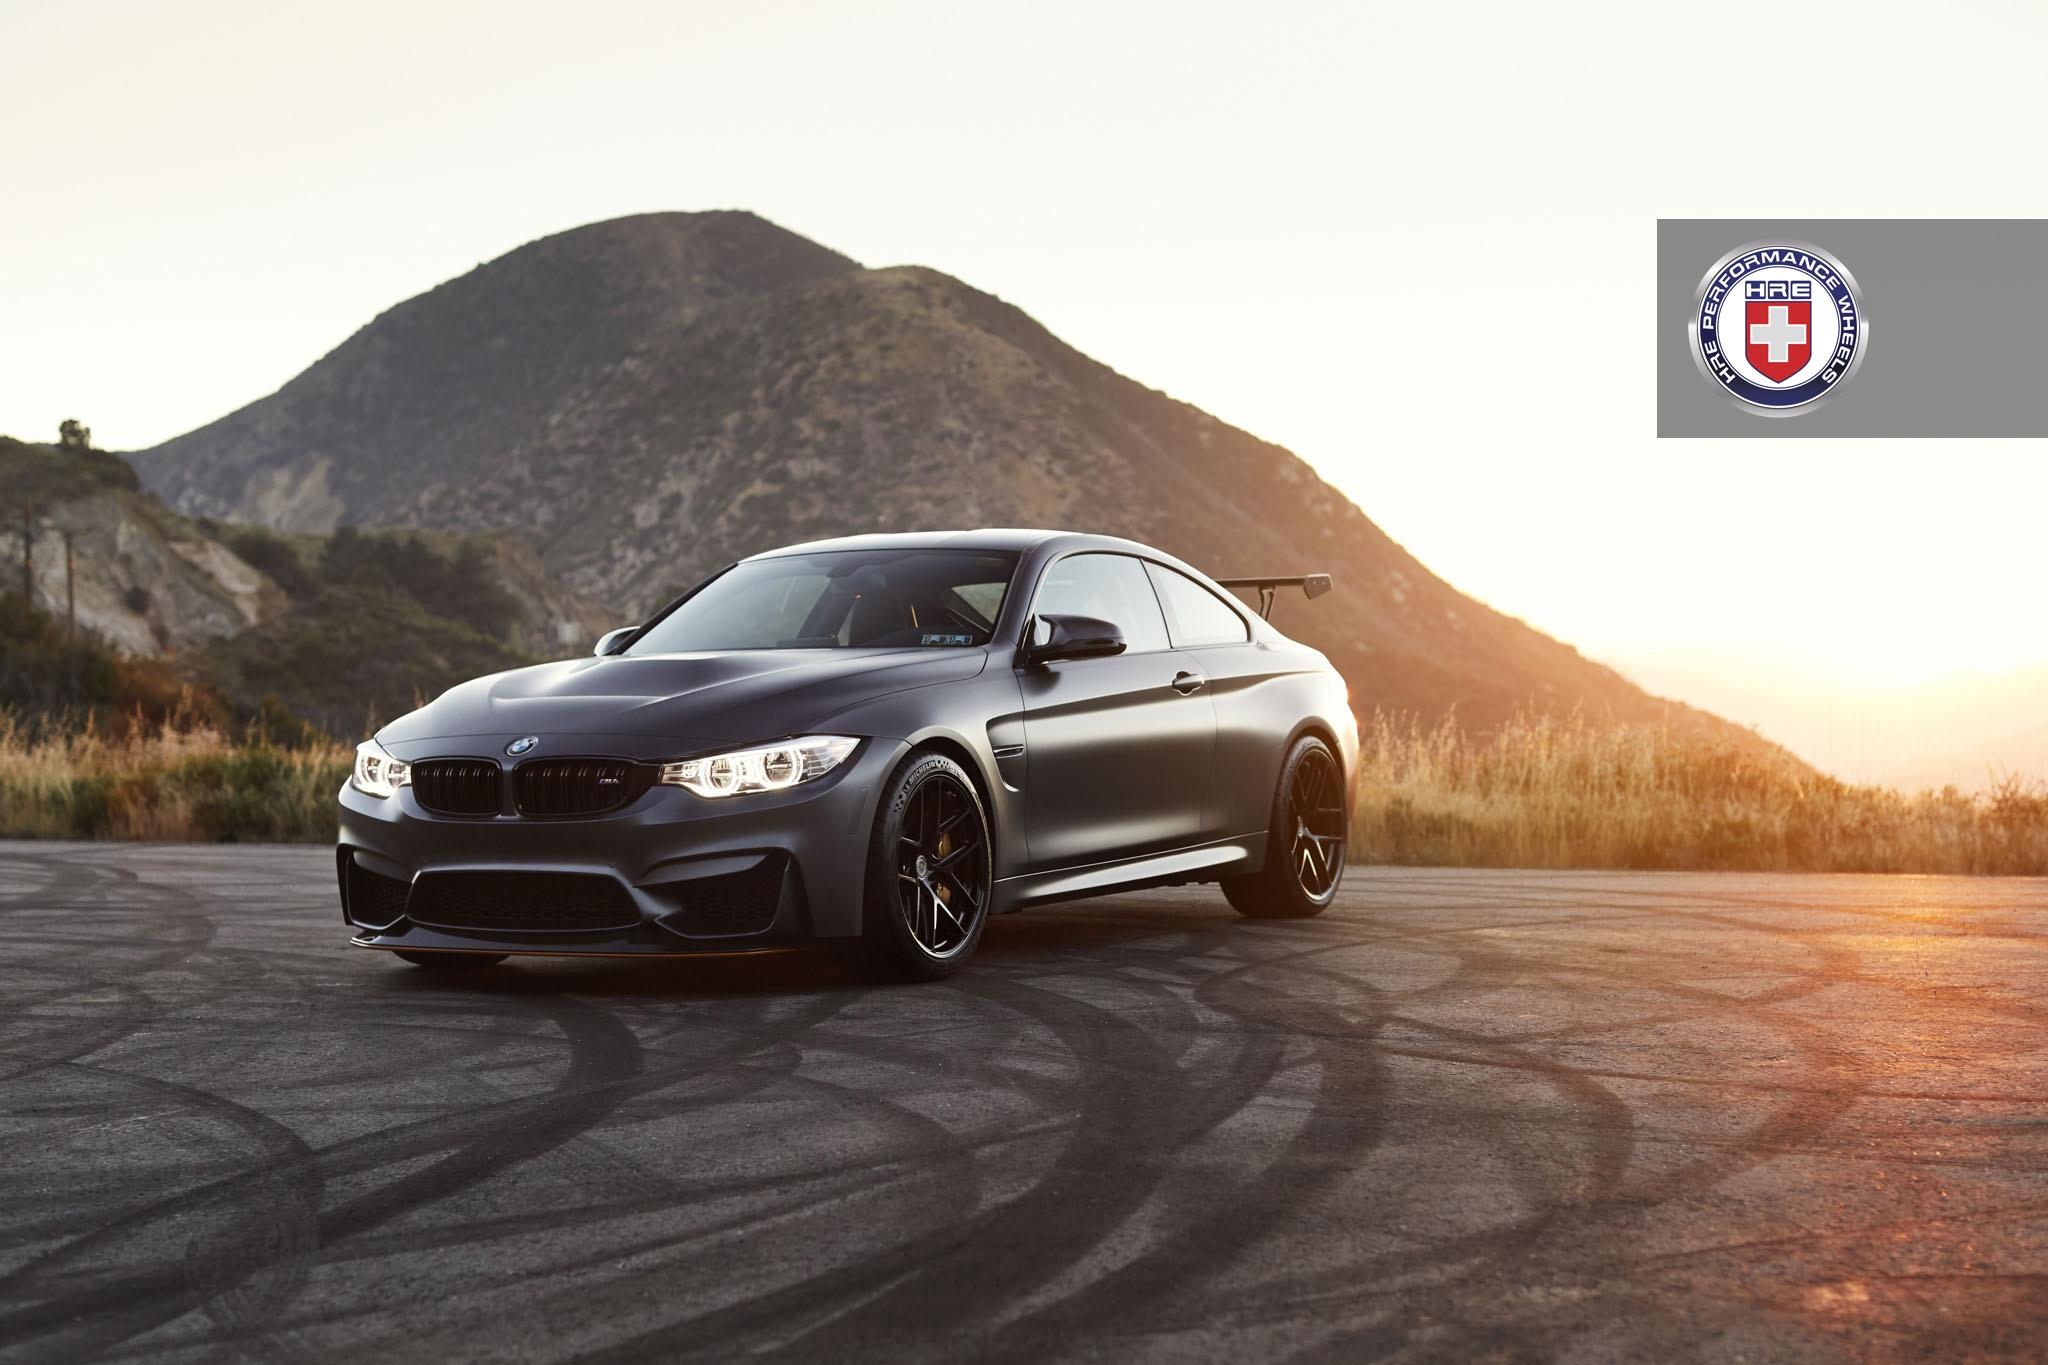 Matte Black BMW M4 GTS with HRE R101 Lightweight Wheels in Gloss Black 5